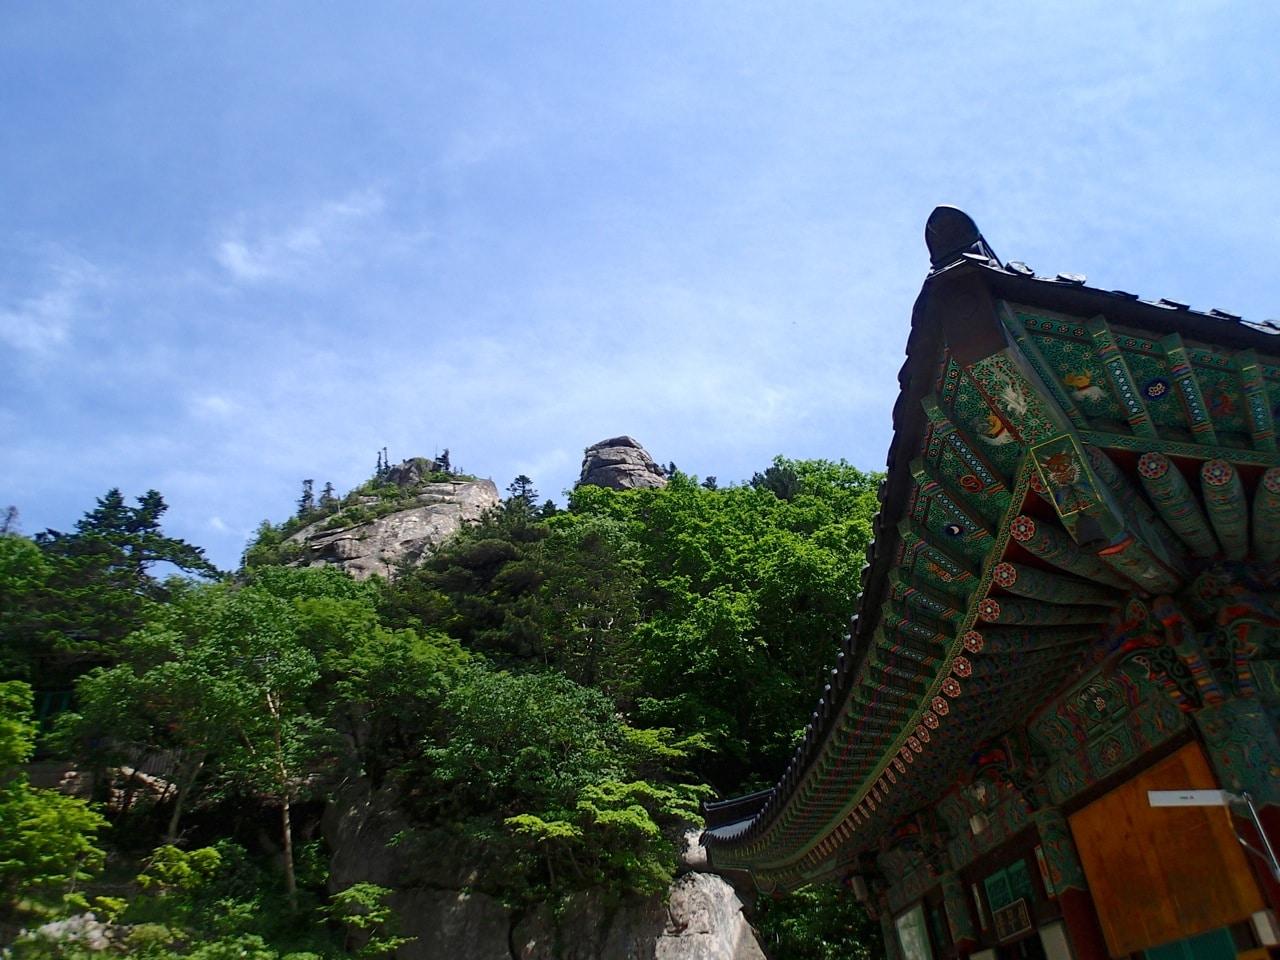 Bongjeong-am Hermitage